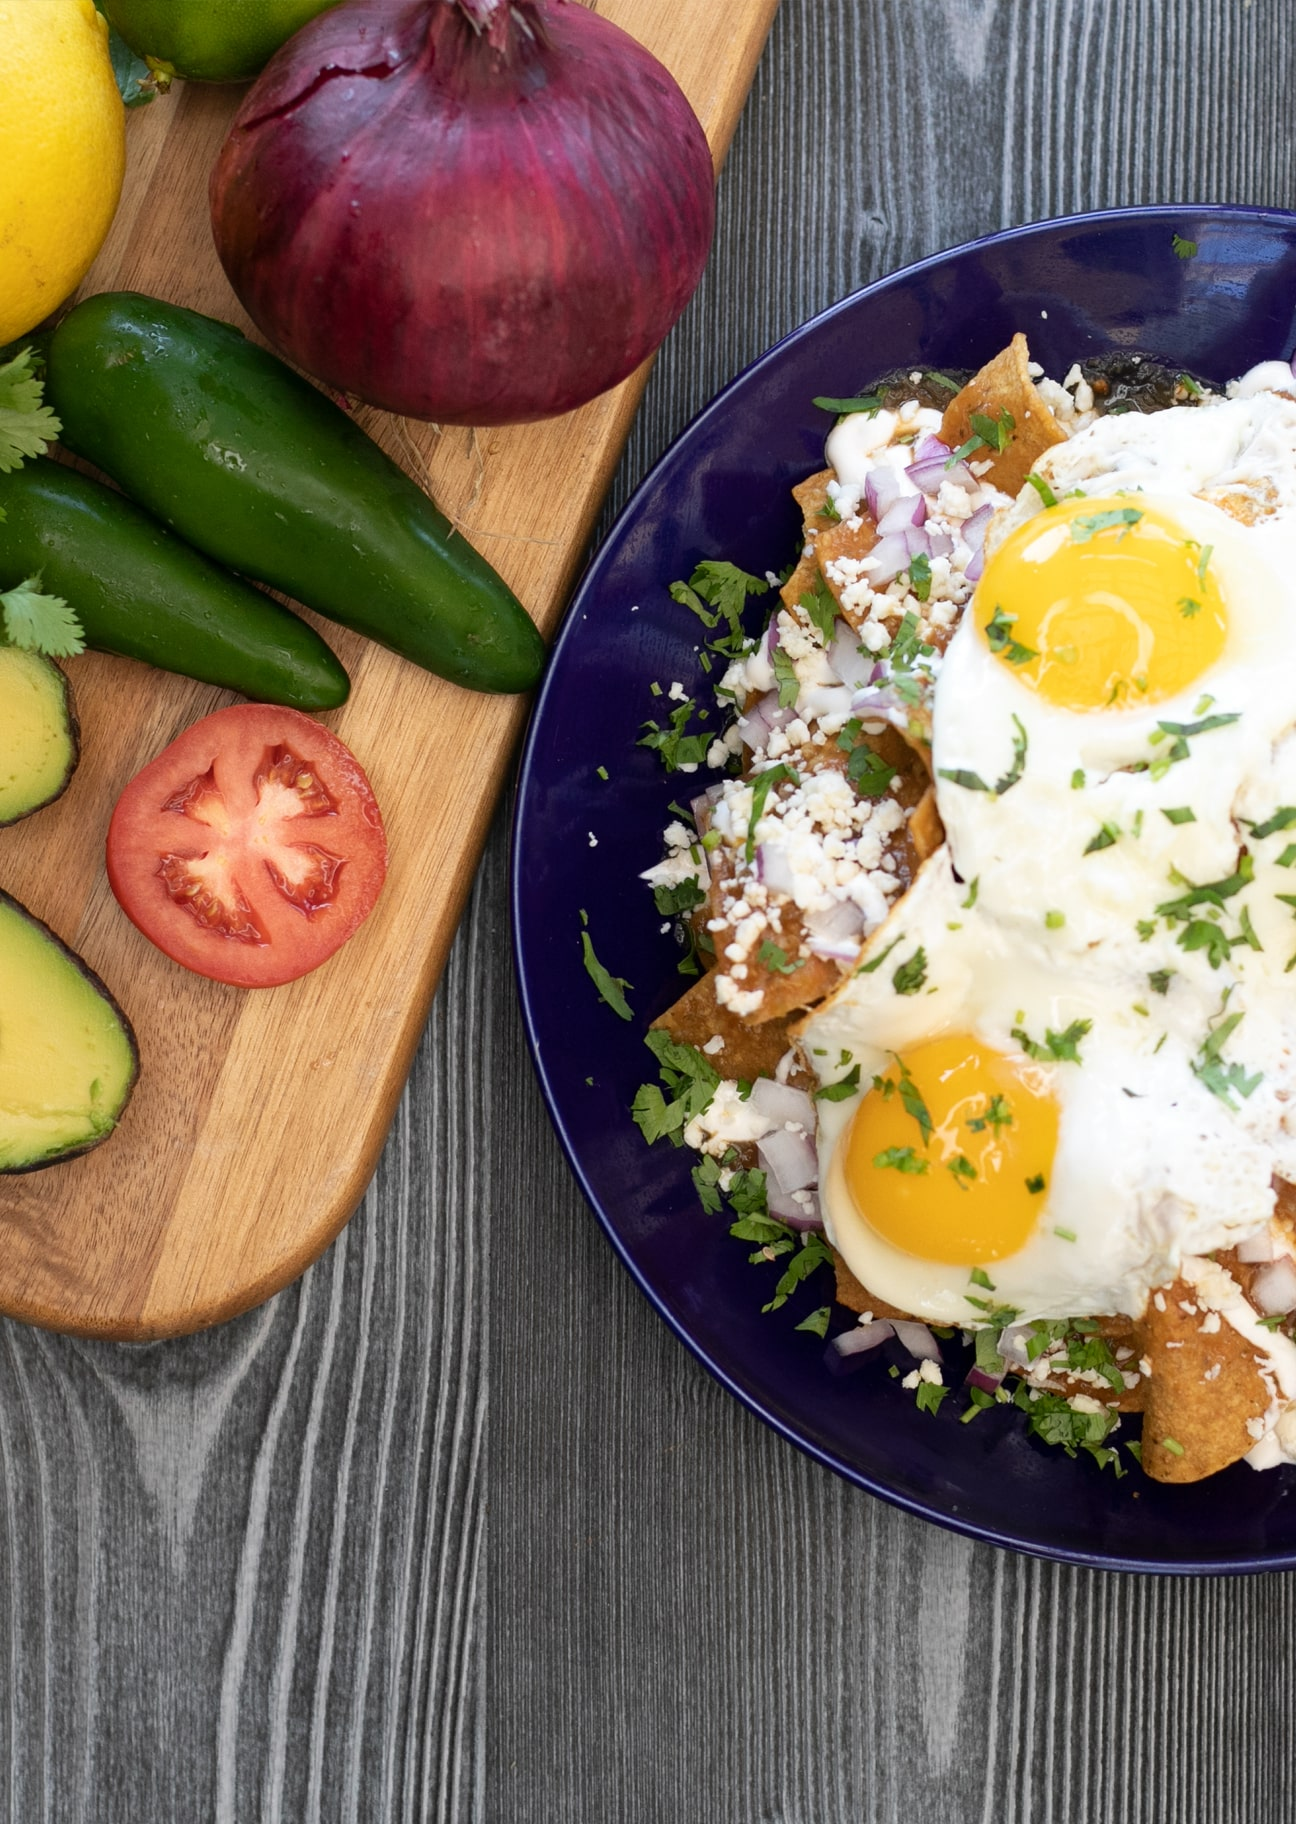 Howdy's Huevos / Eggs